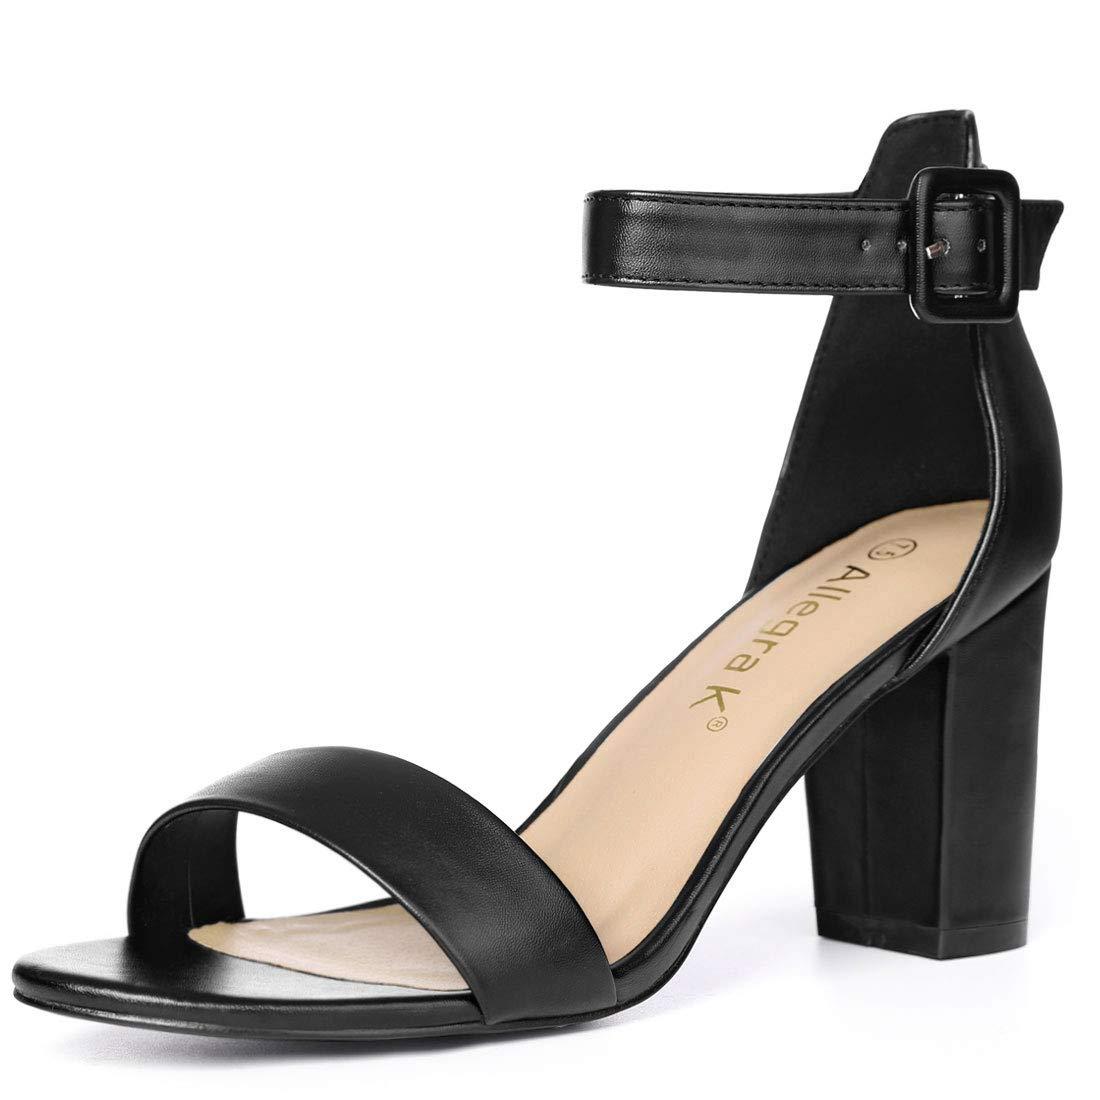 ec75de470dfb1 Allegra K Women's High Chunky Heel Buckle Ankle Strap Sandals